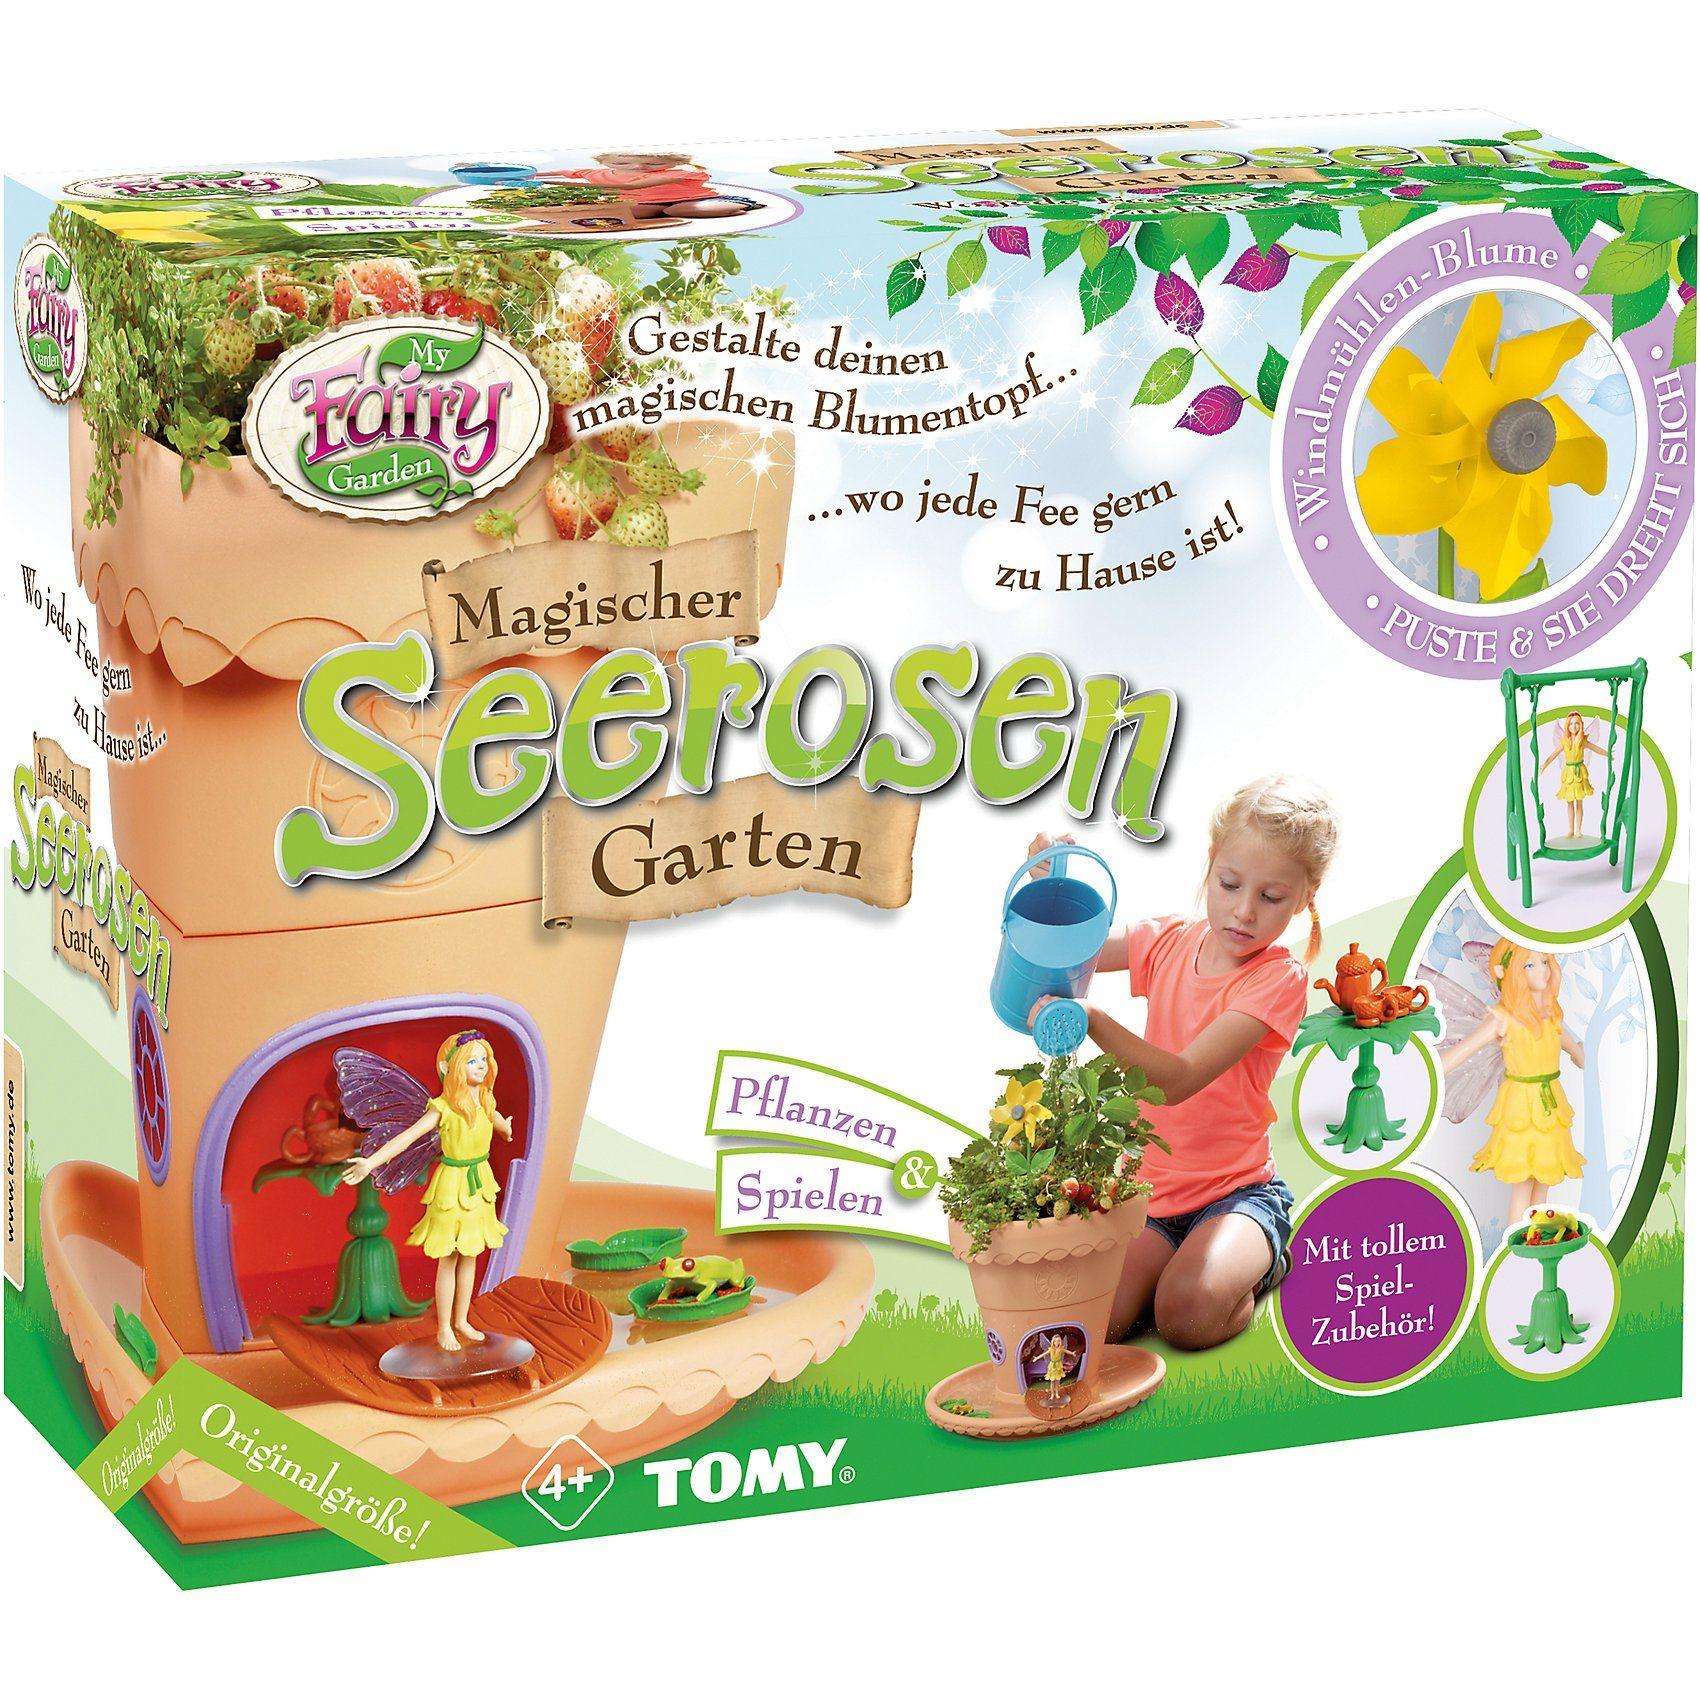 Tomy® My Fairy Garden - Magischer Seerosen Garten